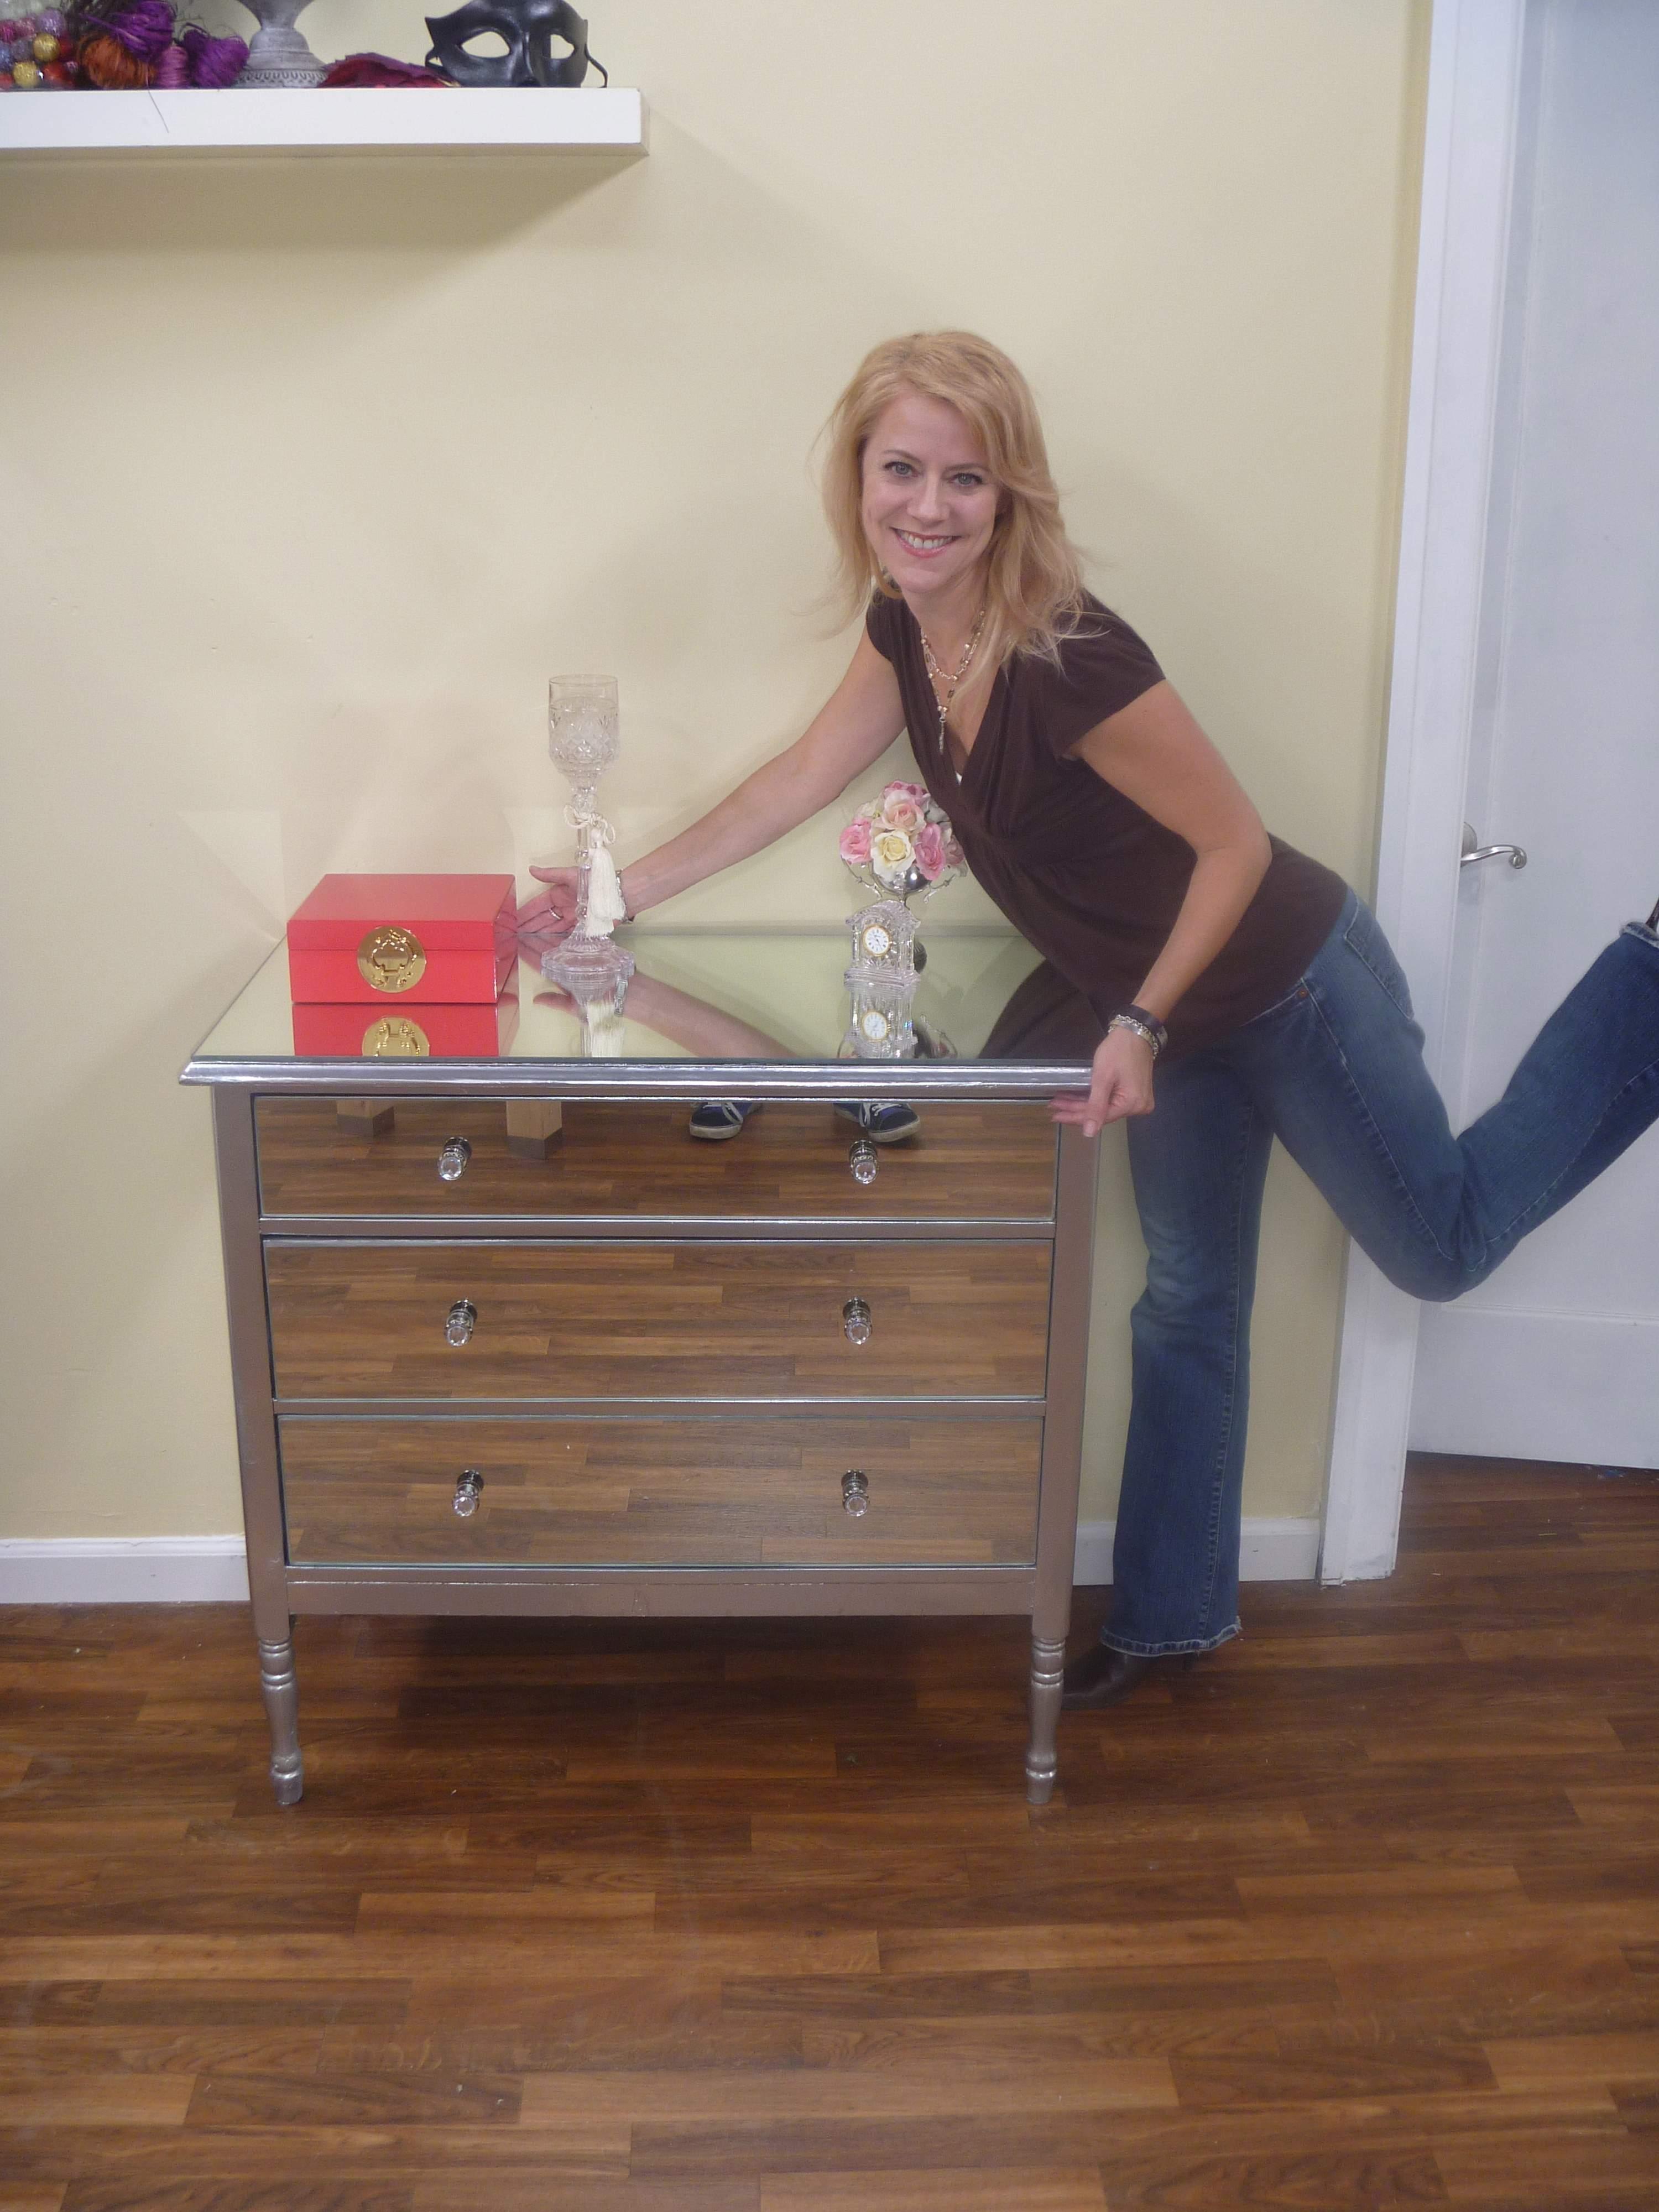 DIY Mirrored Dresser  The Tamara Blog